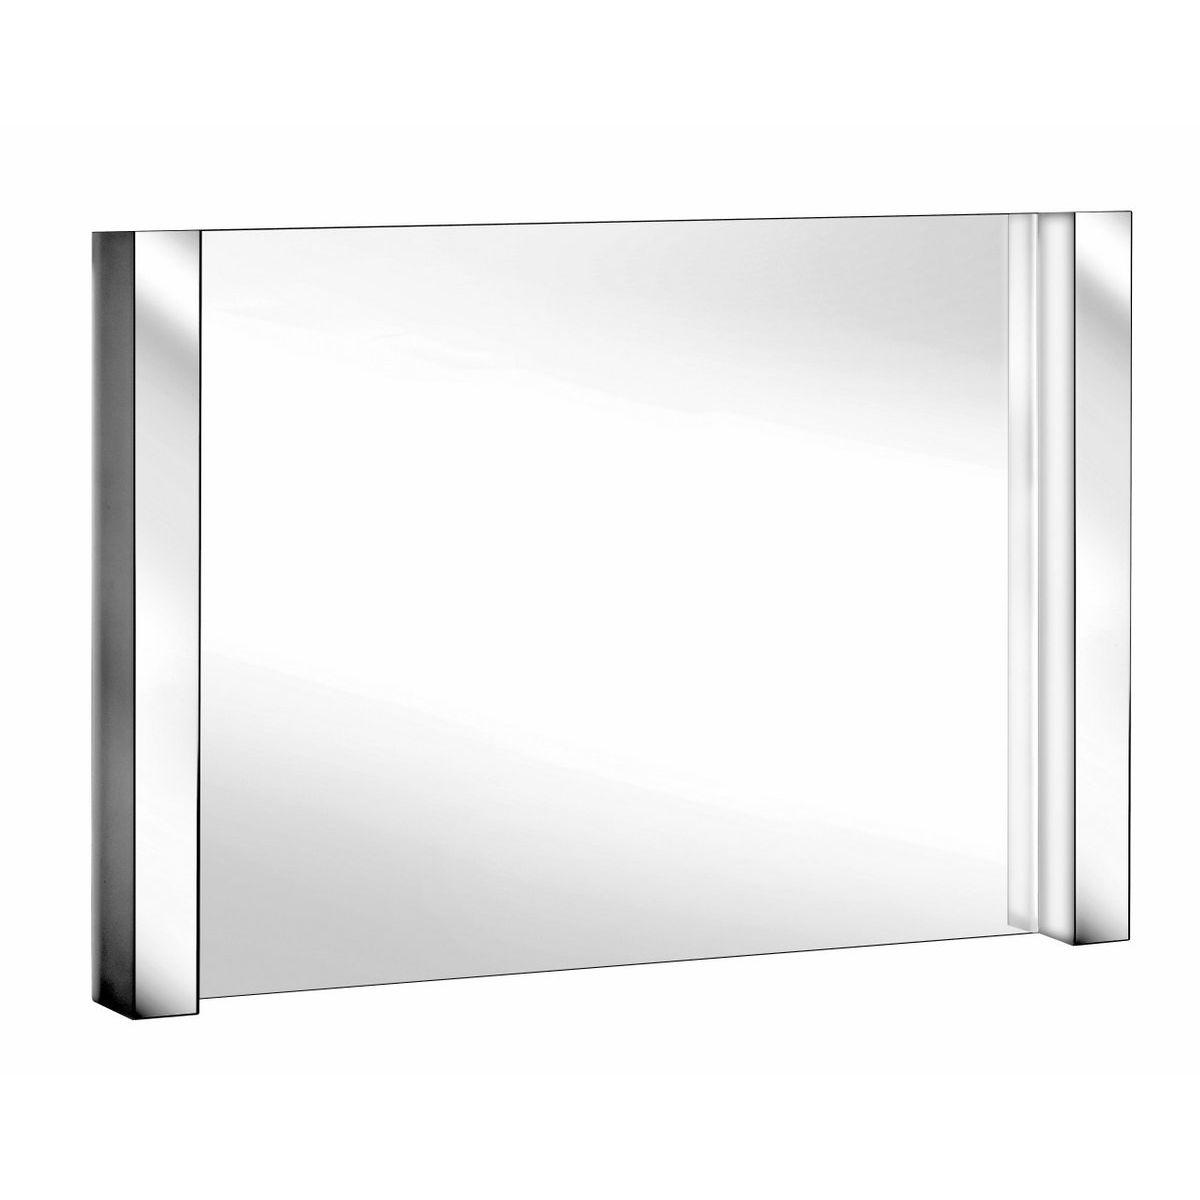 Keuco elegance illuminated bathroom mirror uk bathrooms for Illuminated mirrors